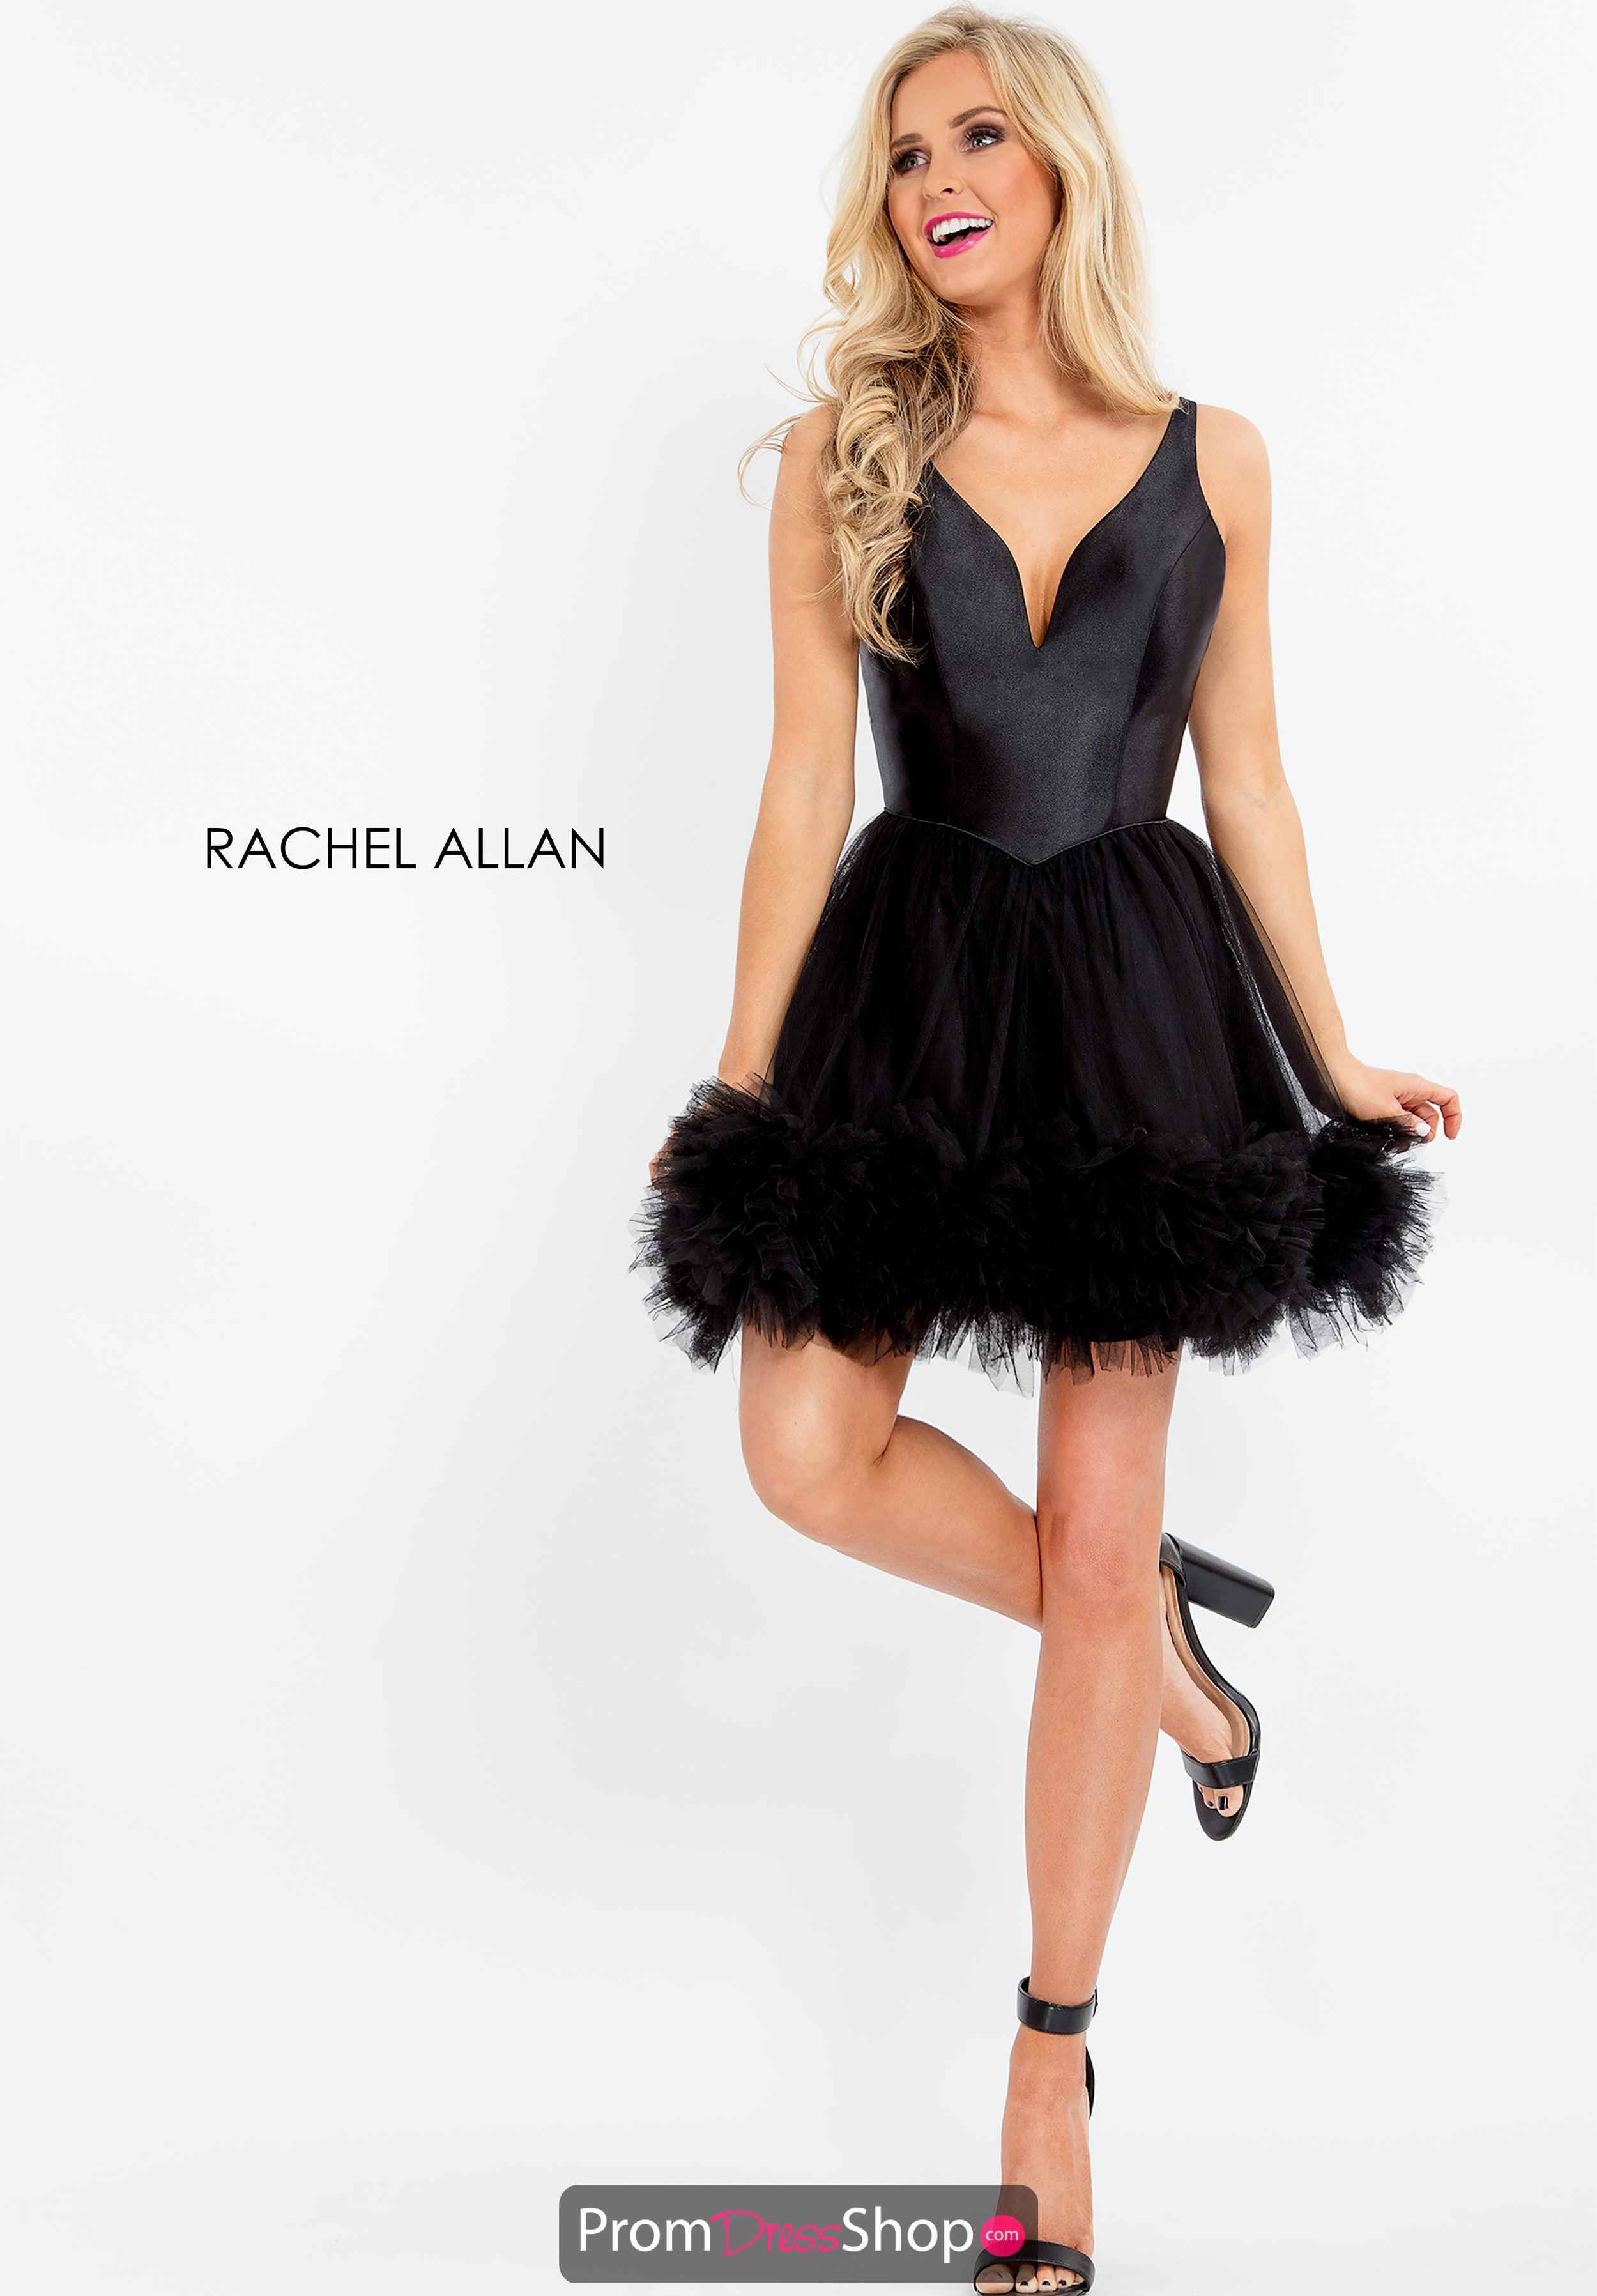 Rachel Allan Prom Dresses Dresses Prom Dress Styles Prom Dresses [ 3594 x 2500 Pixel ]